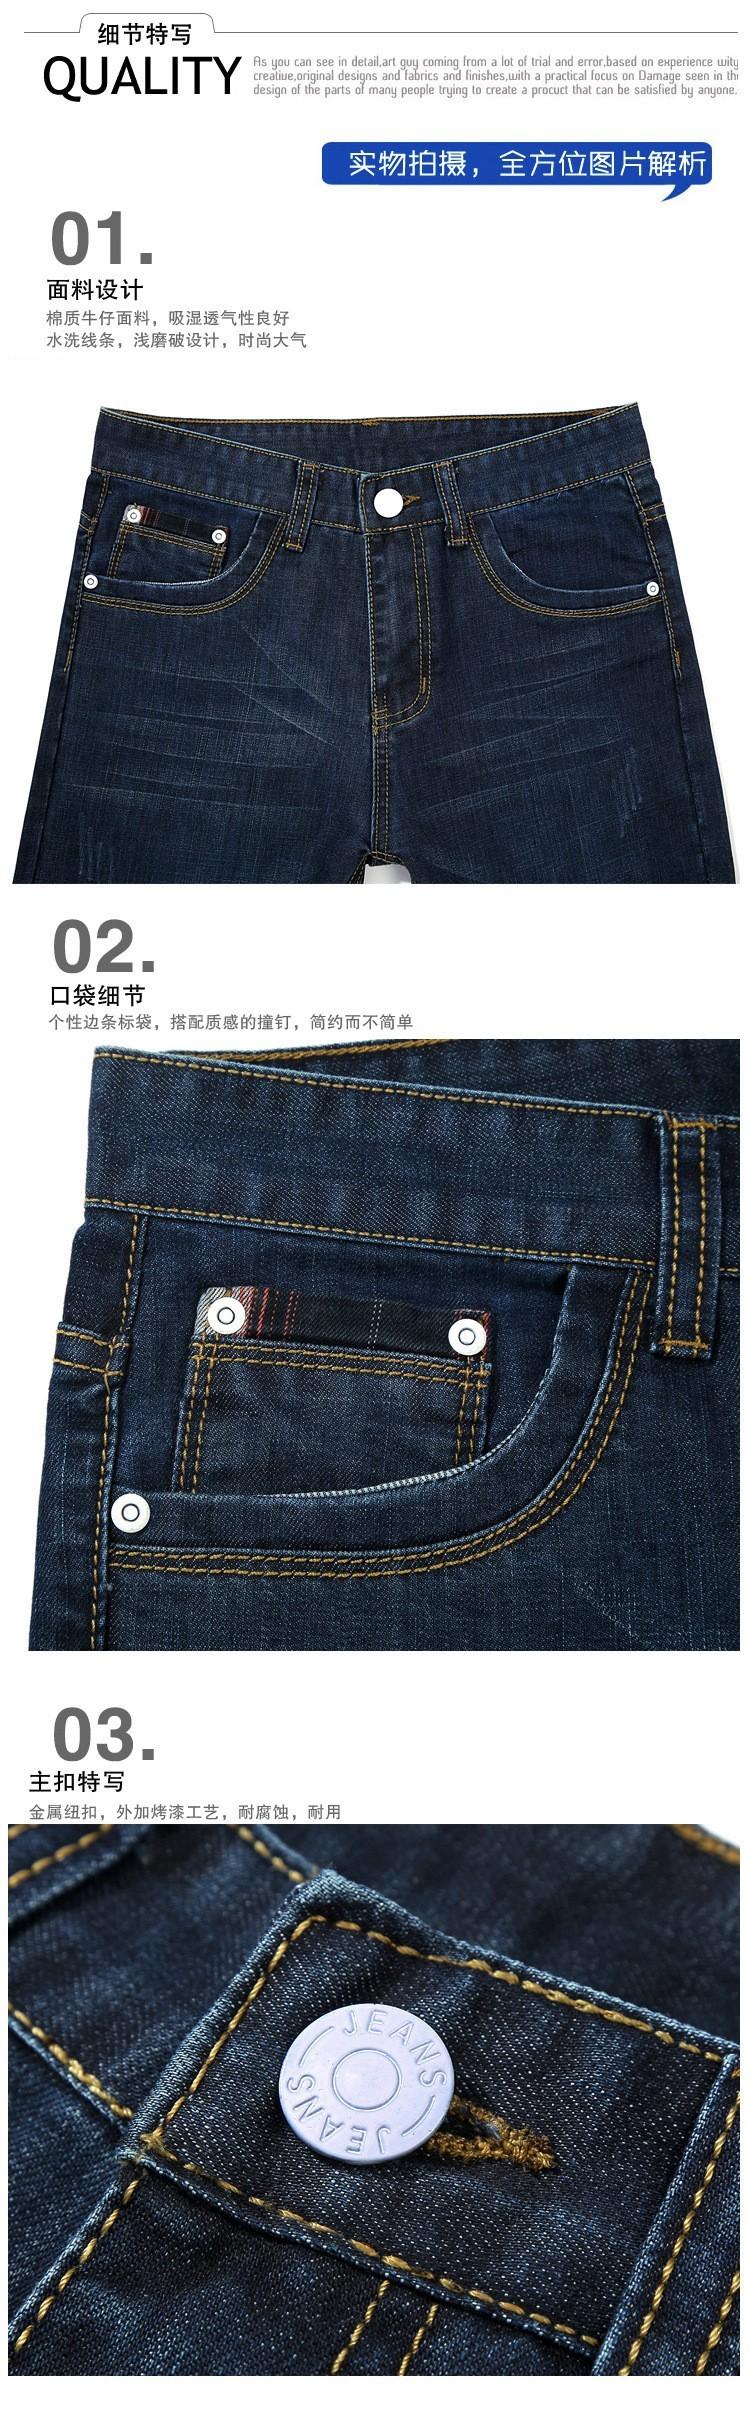 2017 spring Men Straight Denim Jeans Plus Size 29-40 High Quality Cotton Logo Mens Trousers fashion men slim jeans